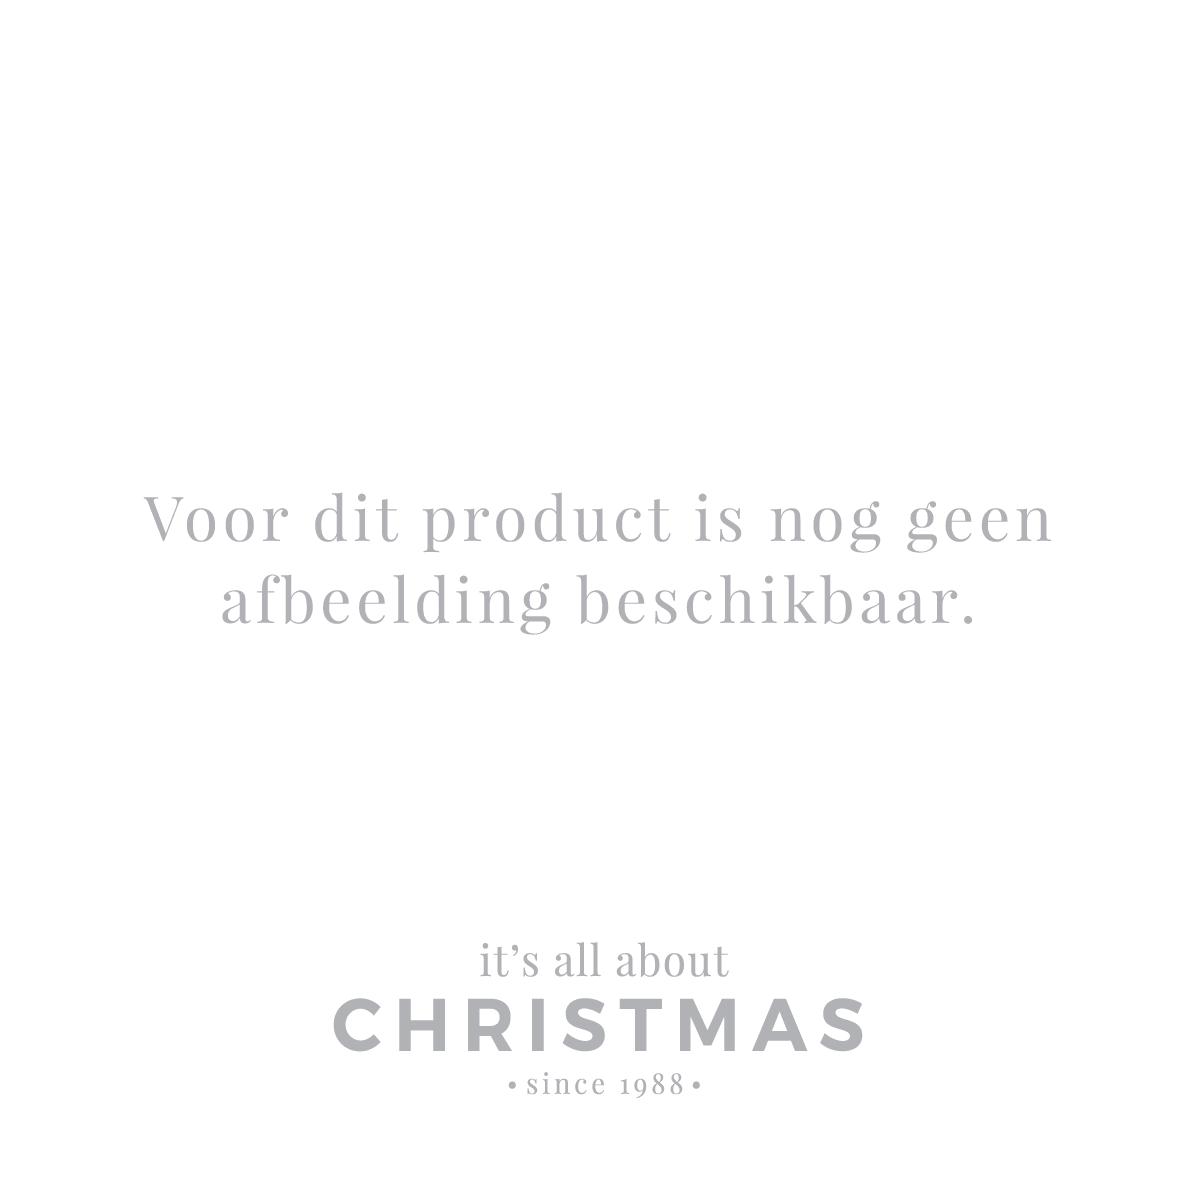 Christbaumkugeln Glas Kupfer.4 Christbaumkugeln Glas Kupfer Mix In Box It S All About Christmas